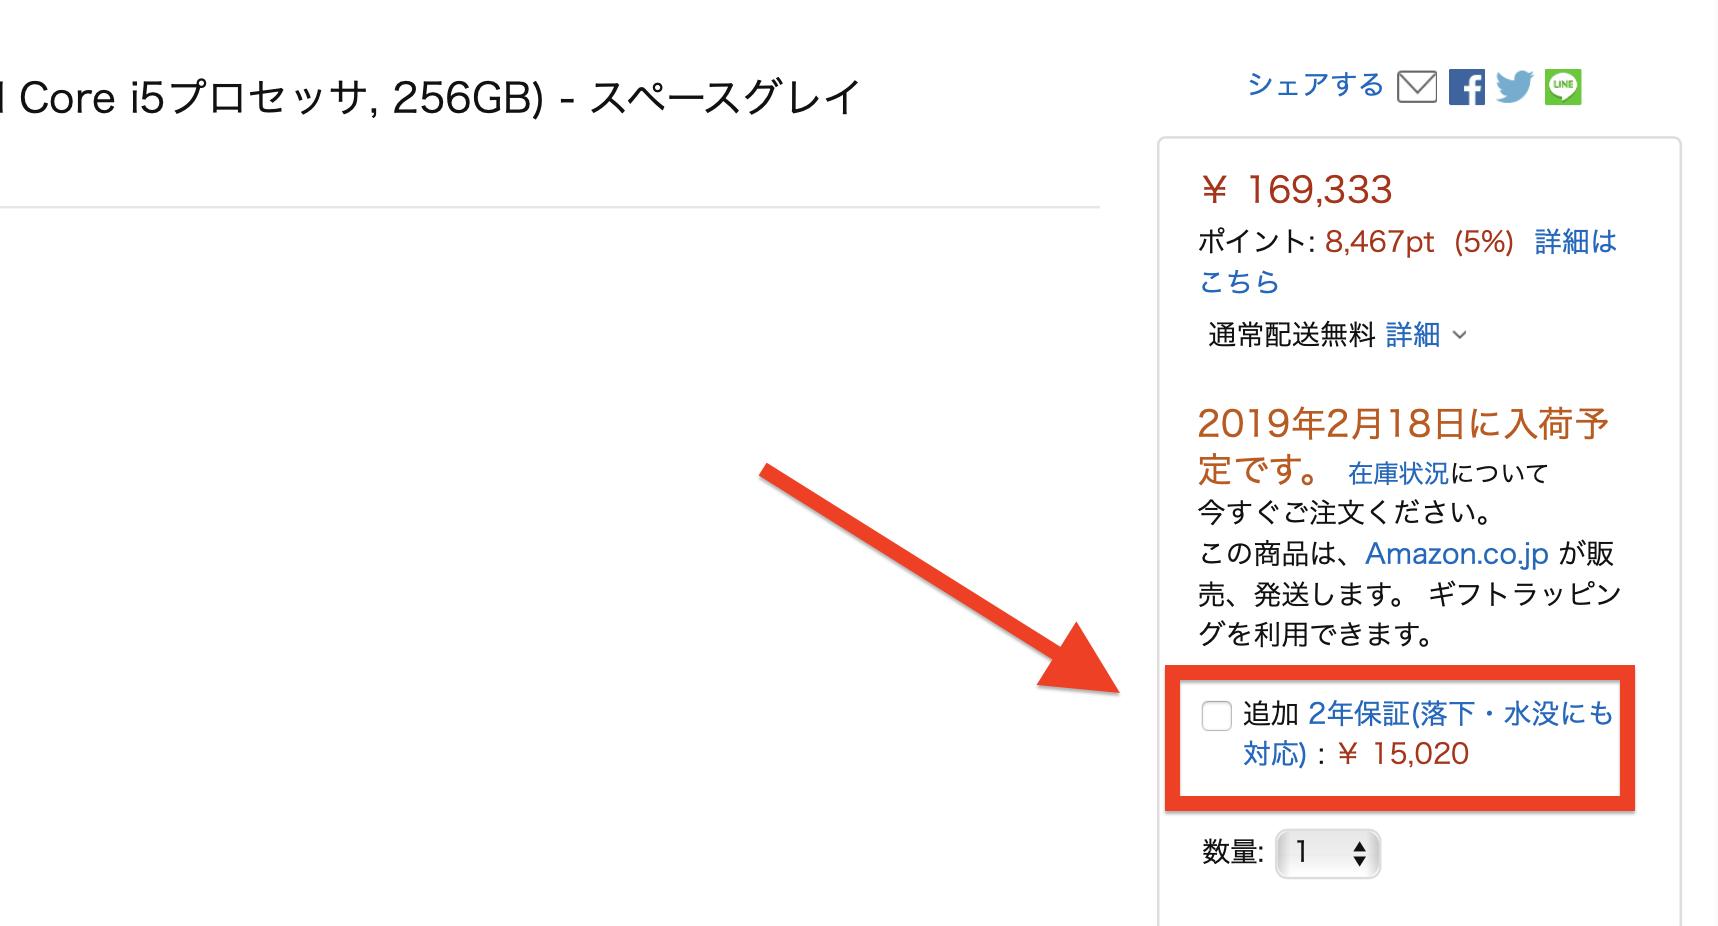 Amazonでアップル製品を買う際の保証